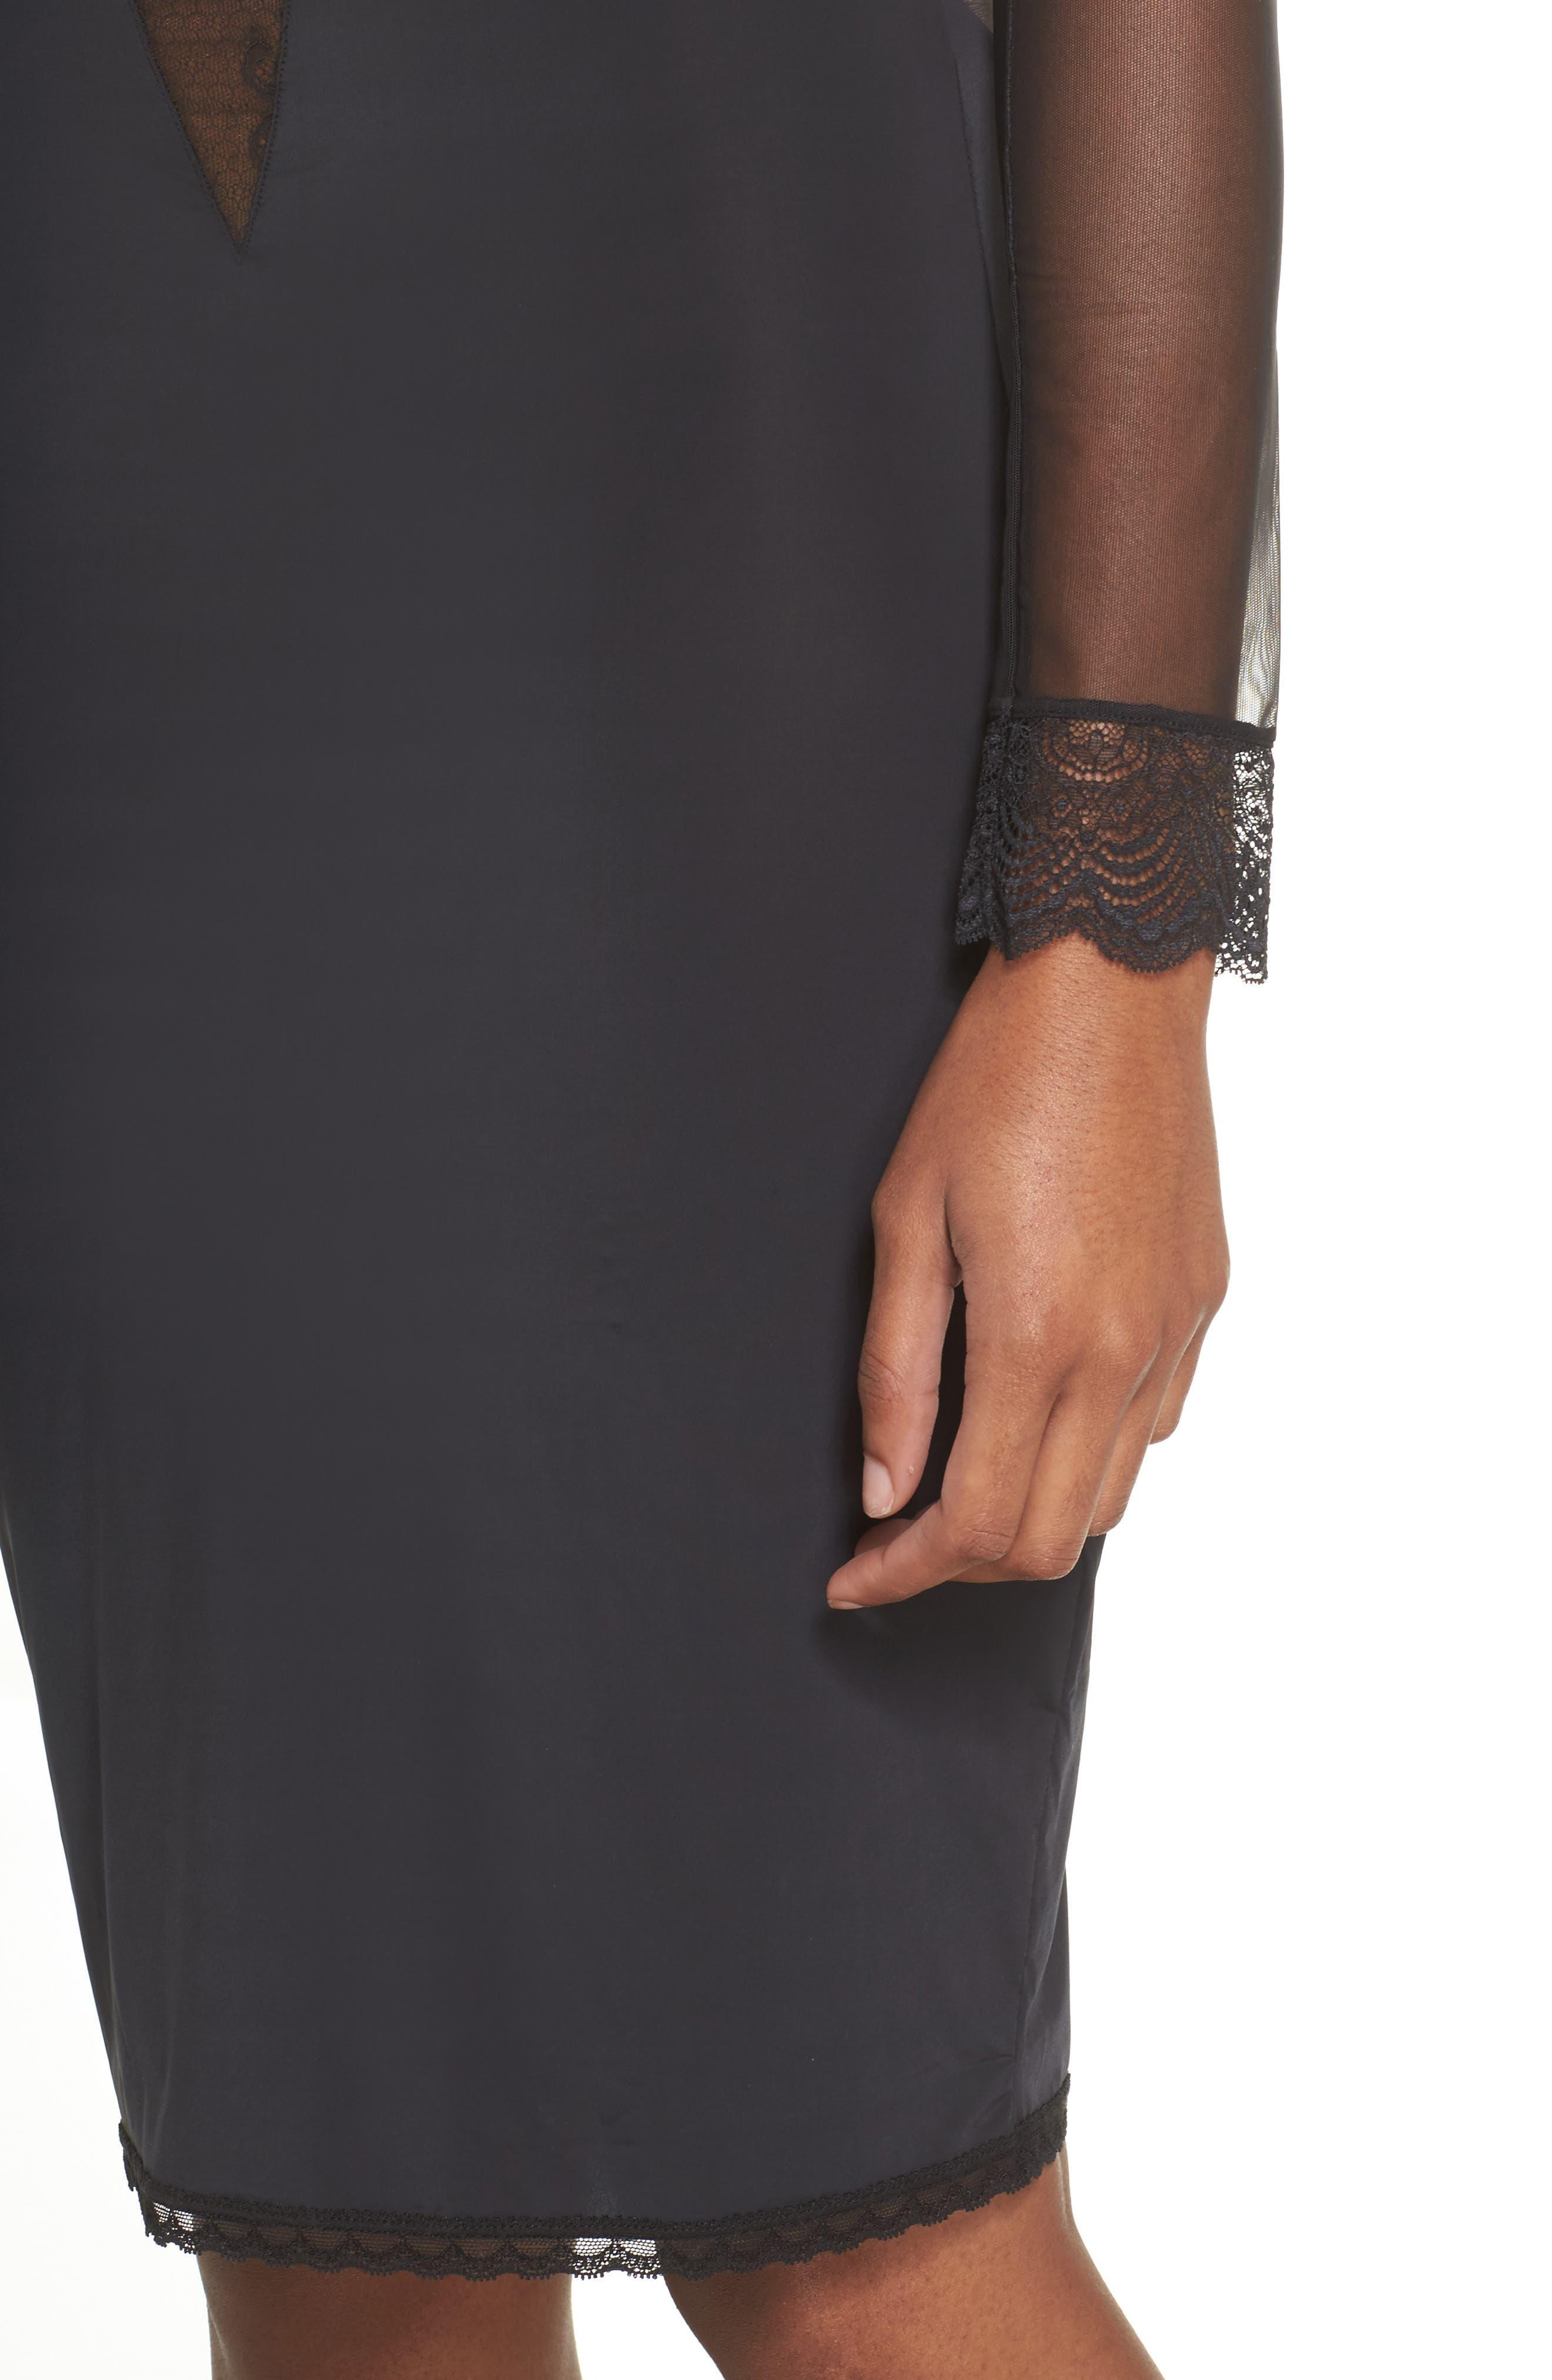 La Directrice Sheer Dress,                             Alternate thumbnail 5, color,                             Black